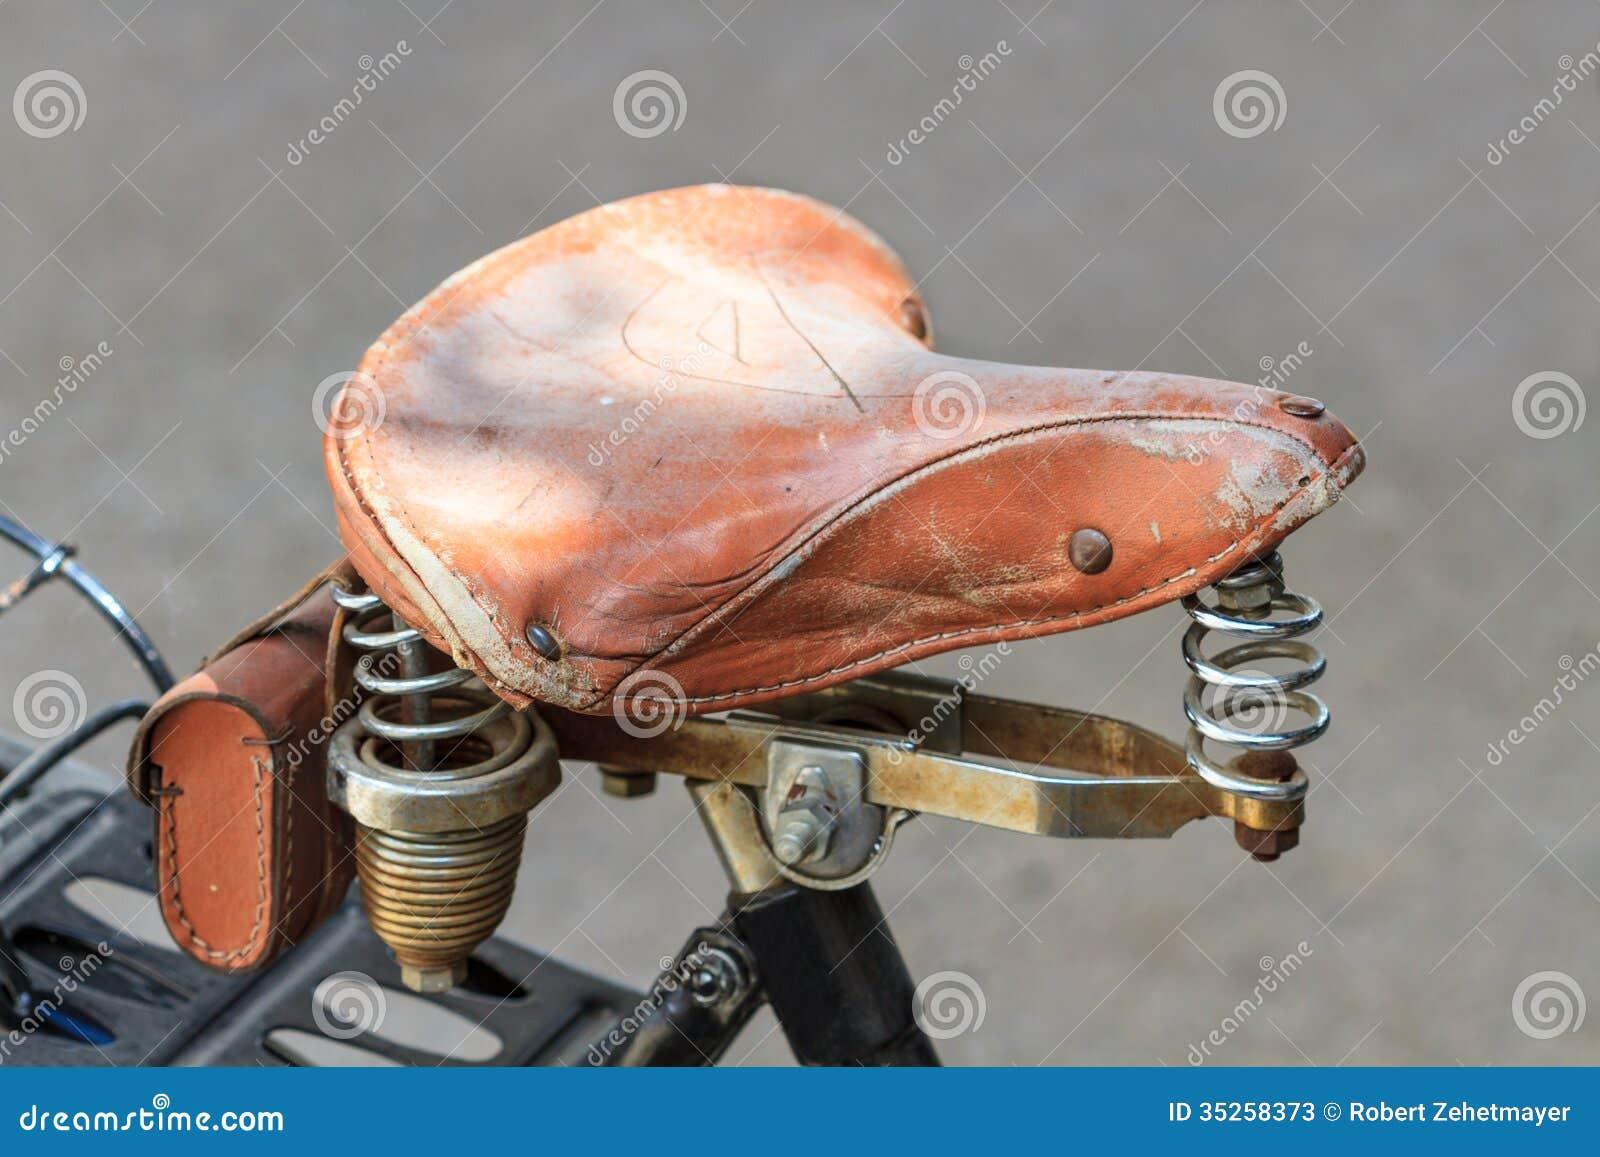 Excellent Vintage bike saddles pity, that